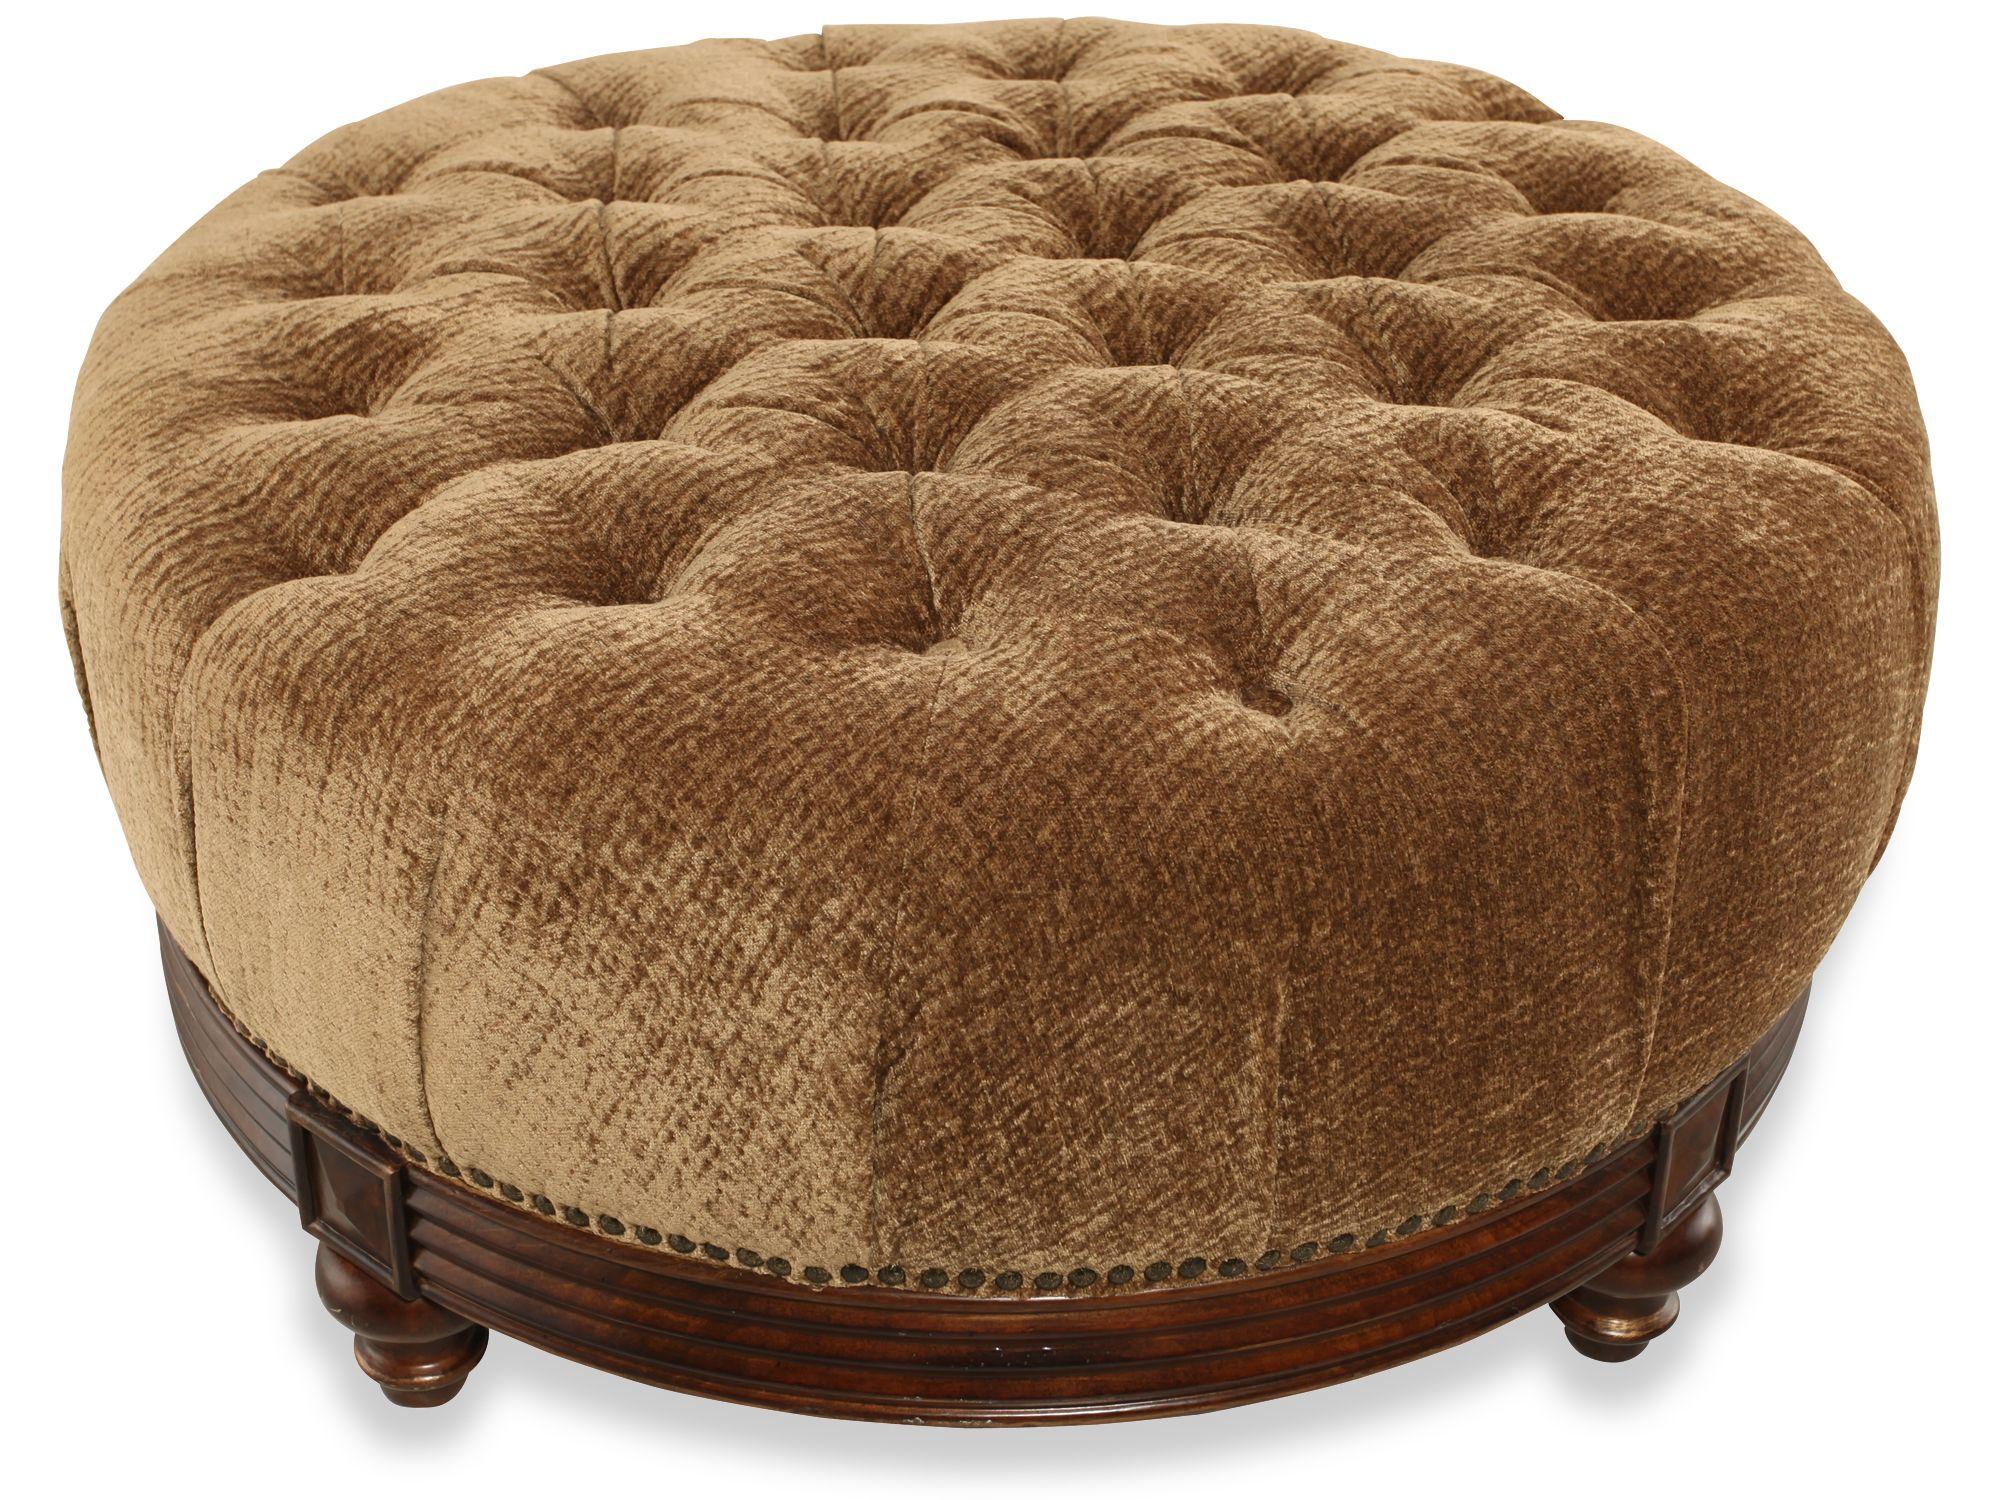 Rachlin Classics Bailey Ottoman Mathis Brothers Furniture